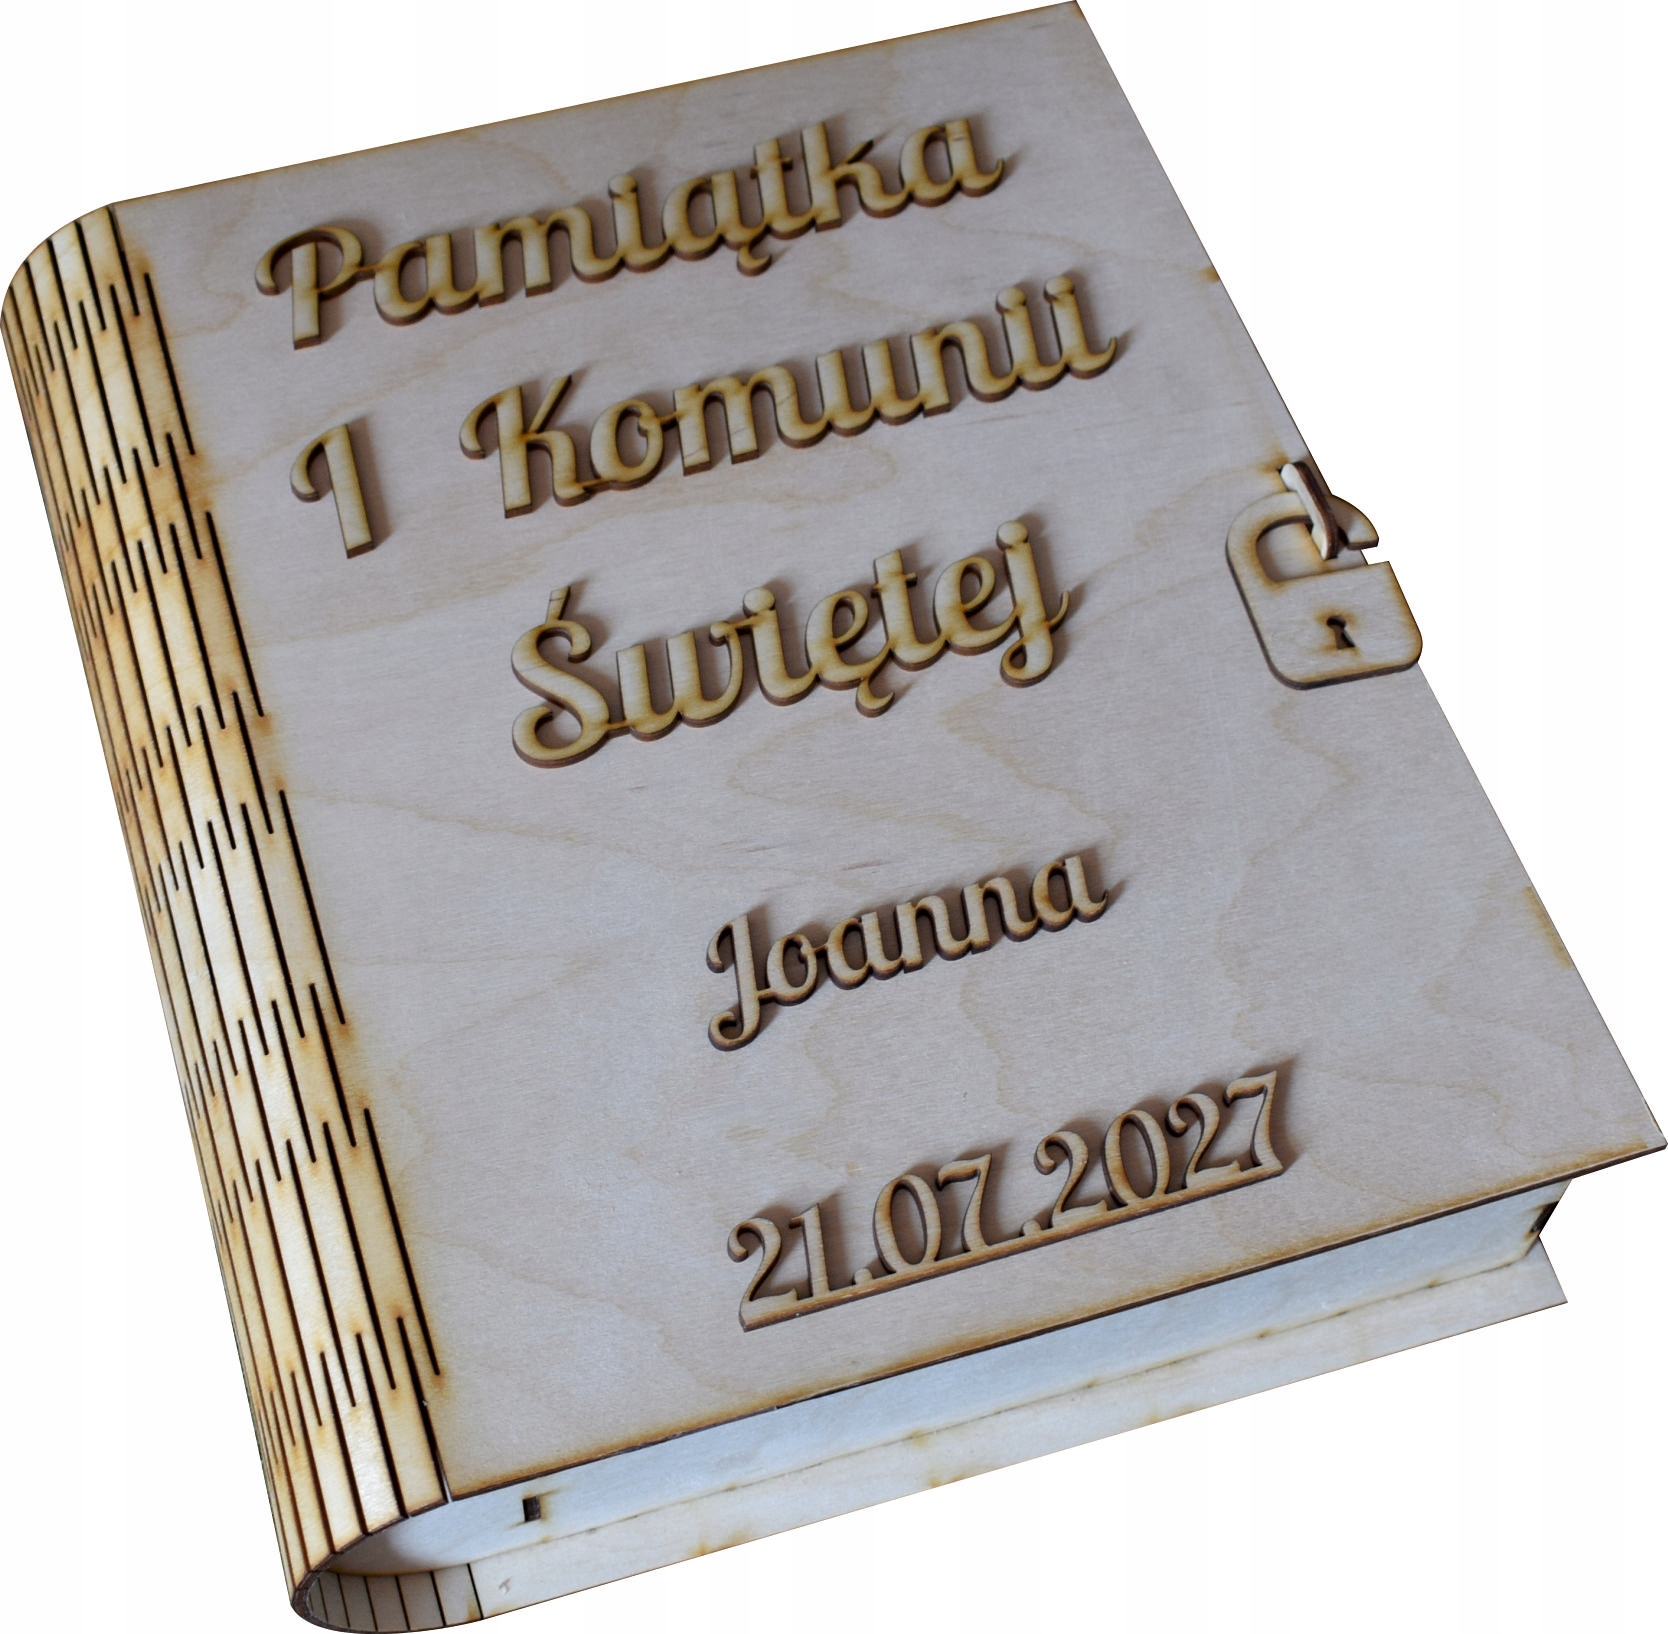 Item SCRIPTURE THE BIBLE IS A SOUVENIR AND COMMUNICATION INITIATION